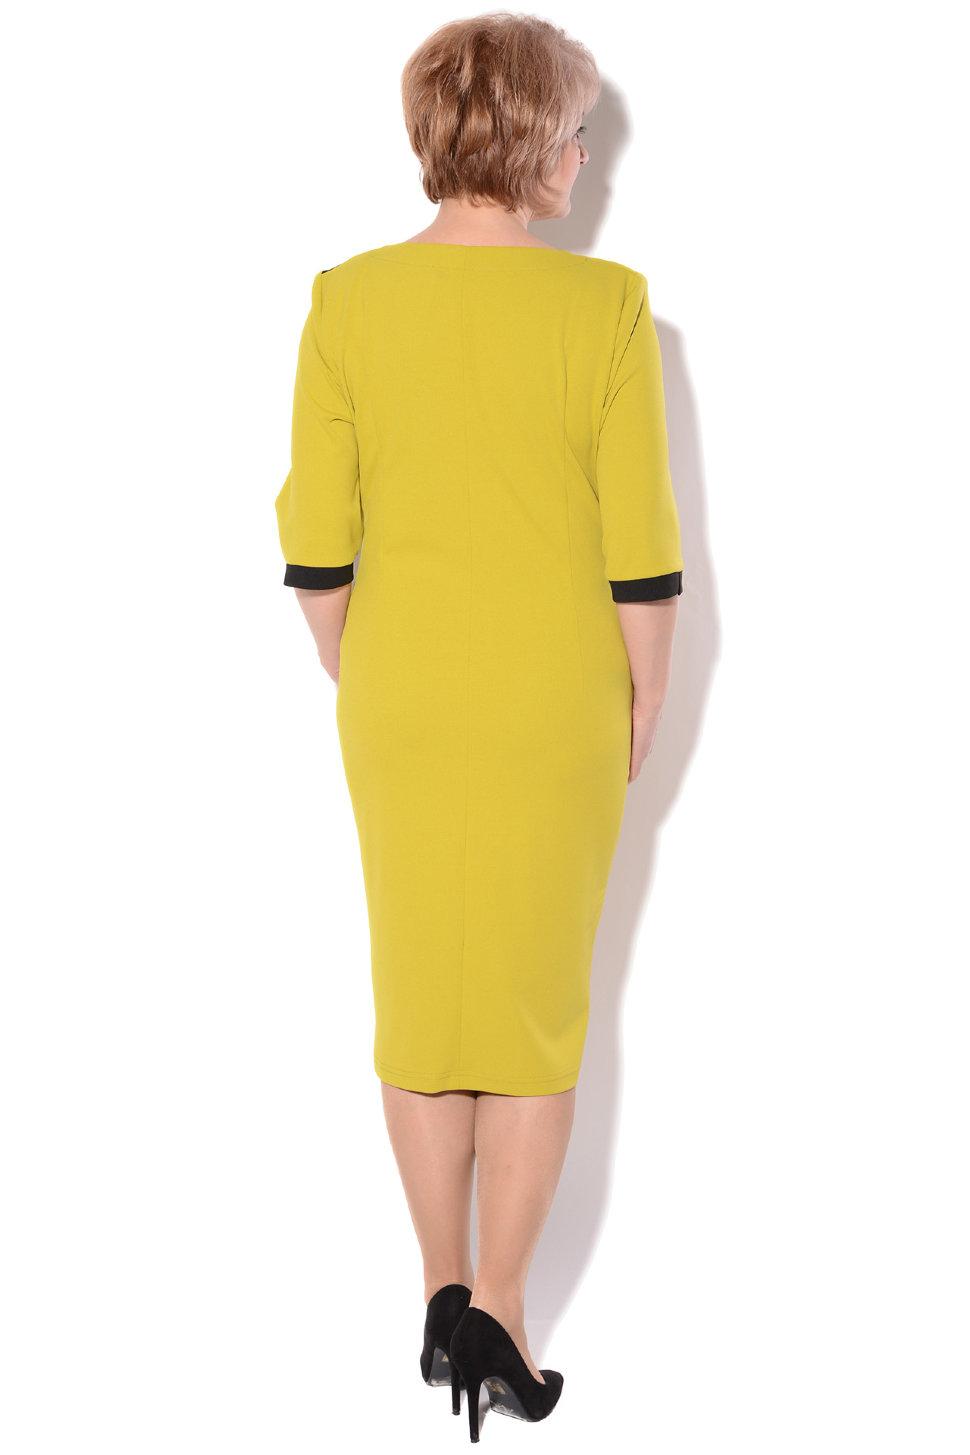 7c03c3b5fd7 Платье Alenka Plus 1440 - Платье Alenka Plus 1440